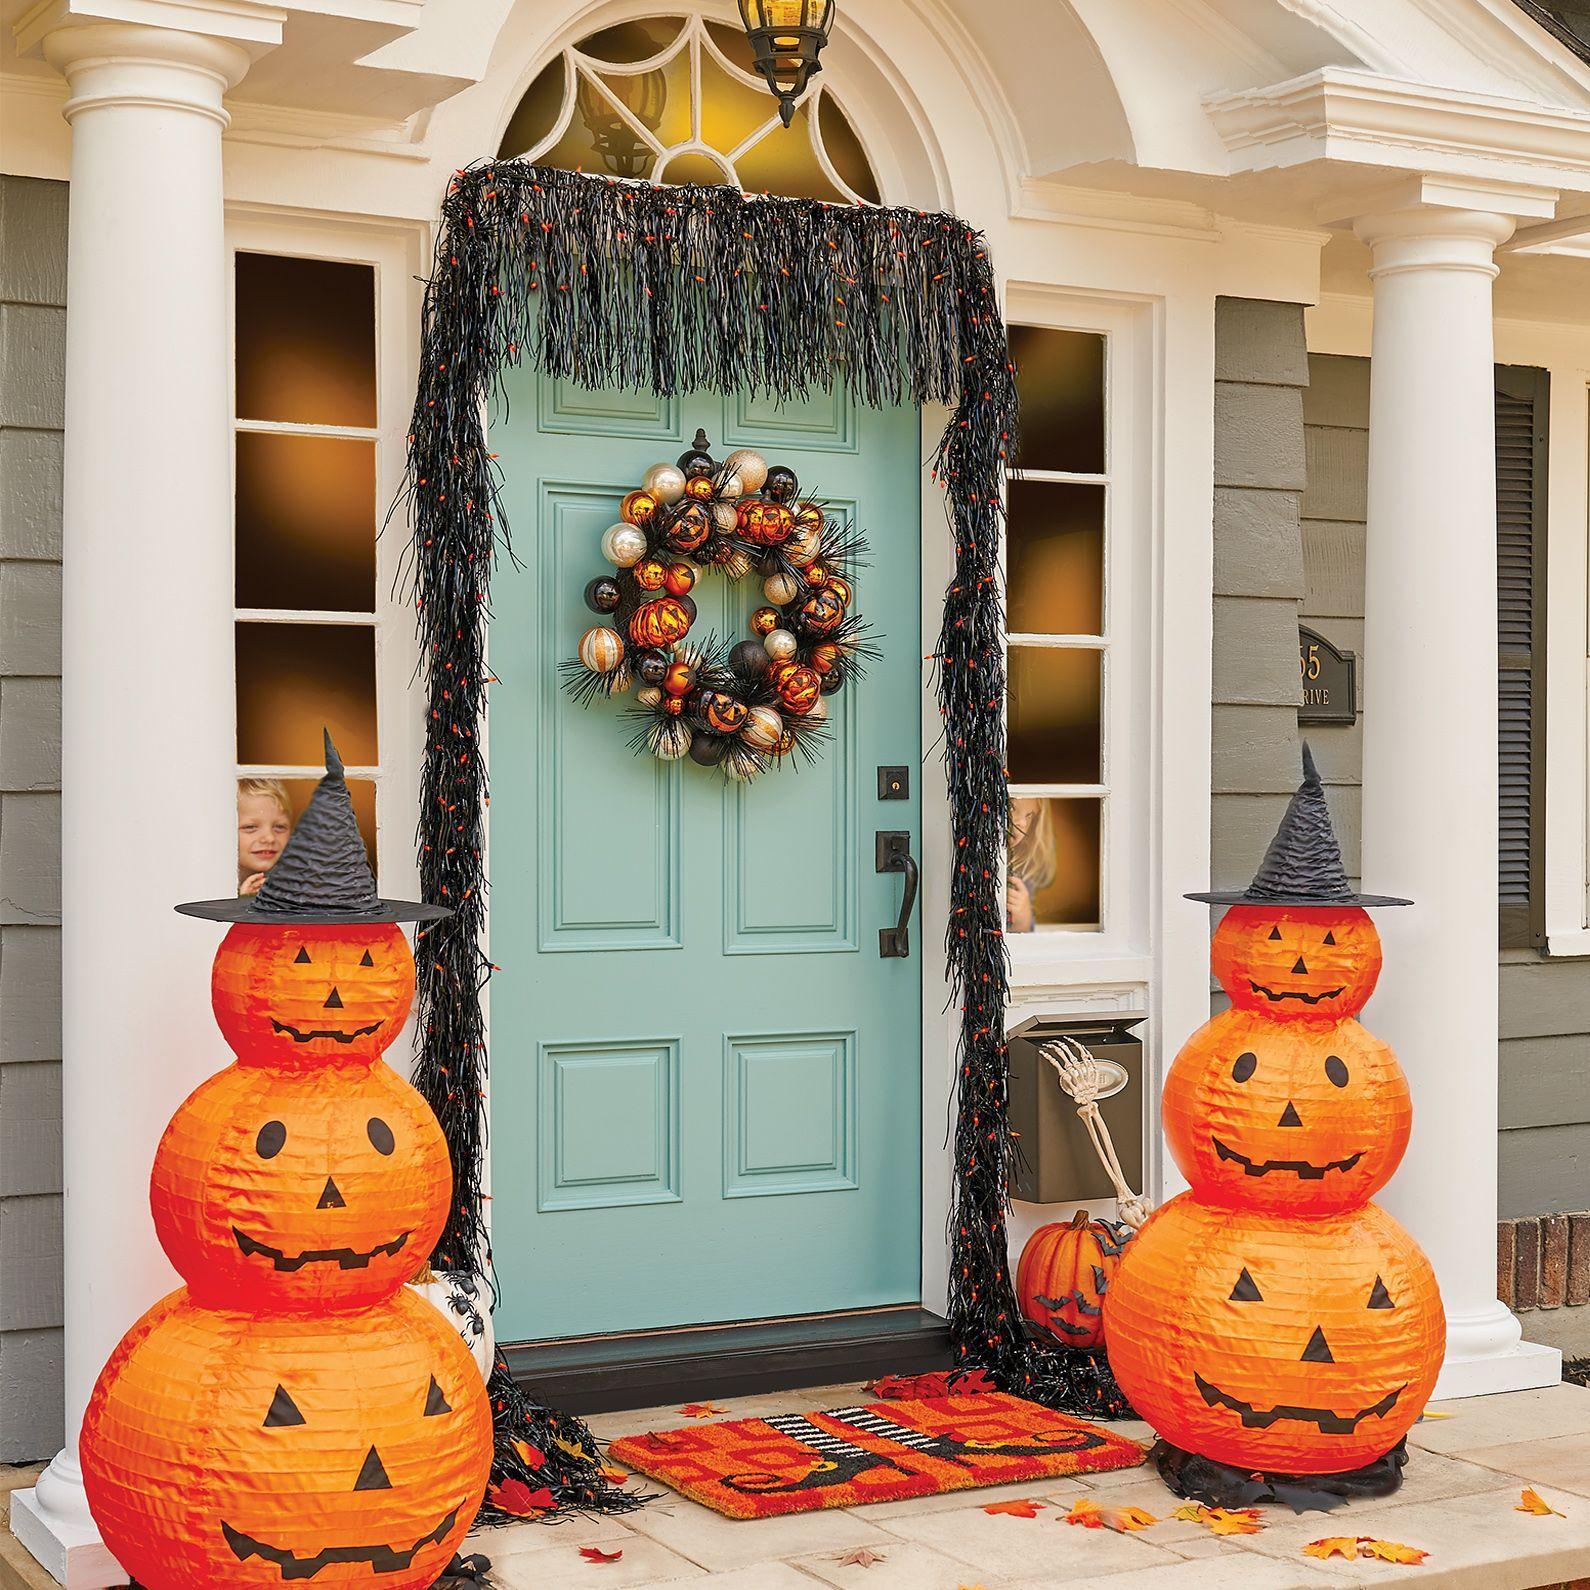 spooky halloween decorations - HD1590×1590